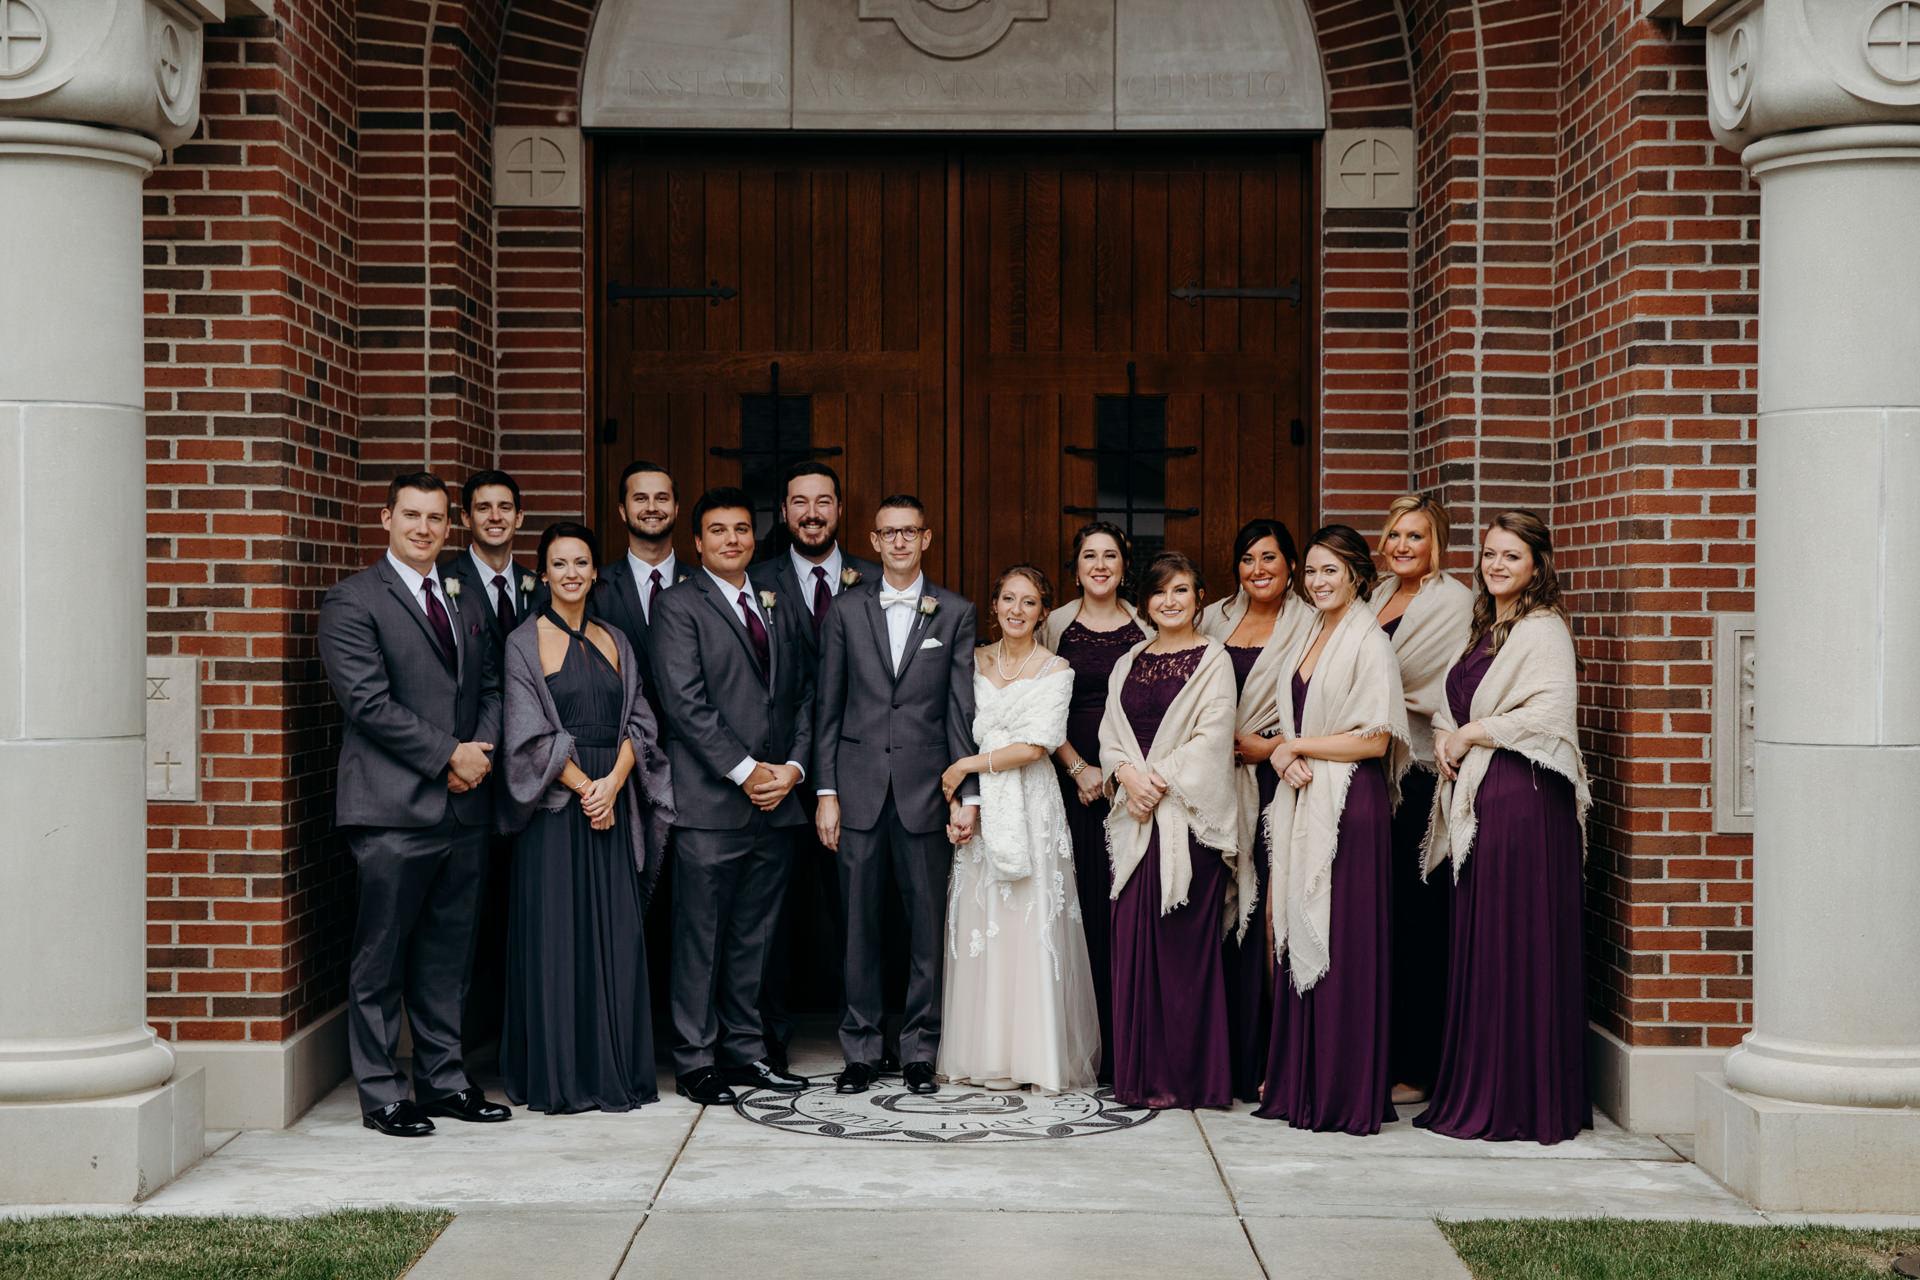 Armory wedding south bend grant beachy photography elkhart goshen -028.jpg